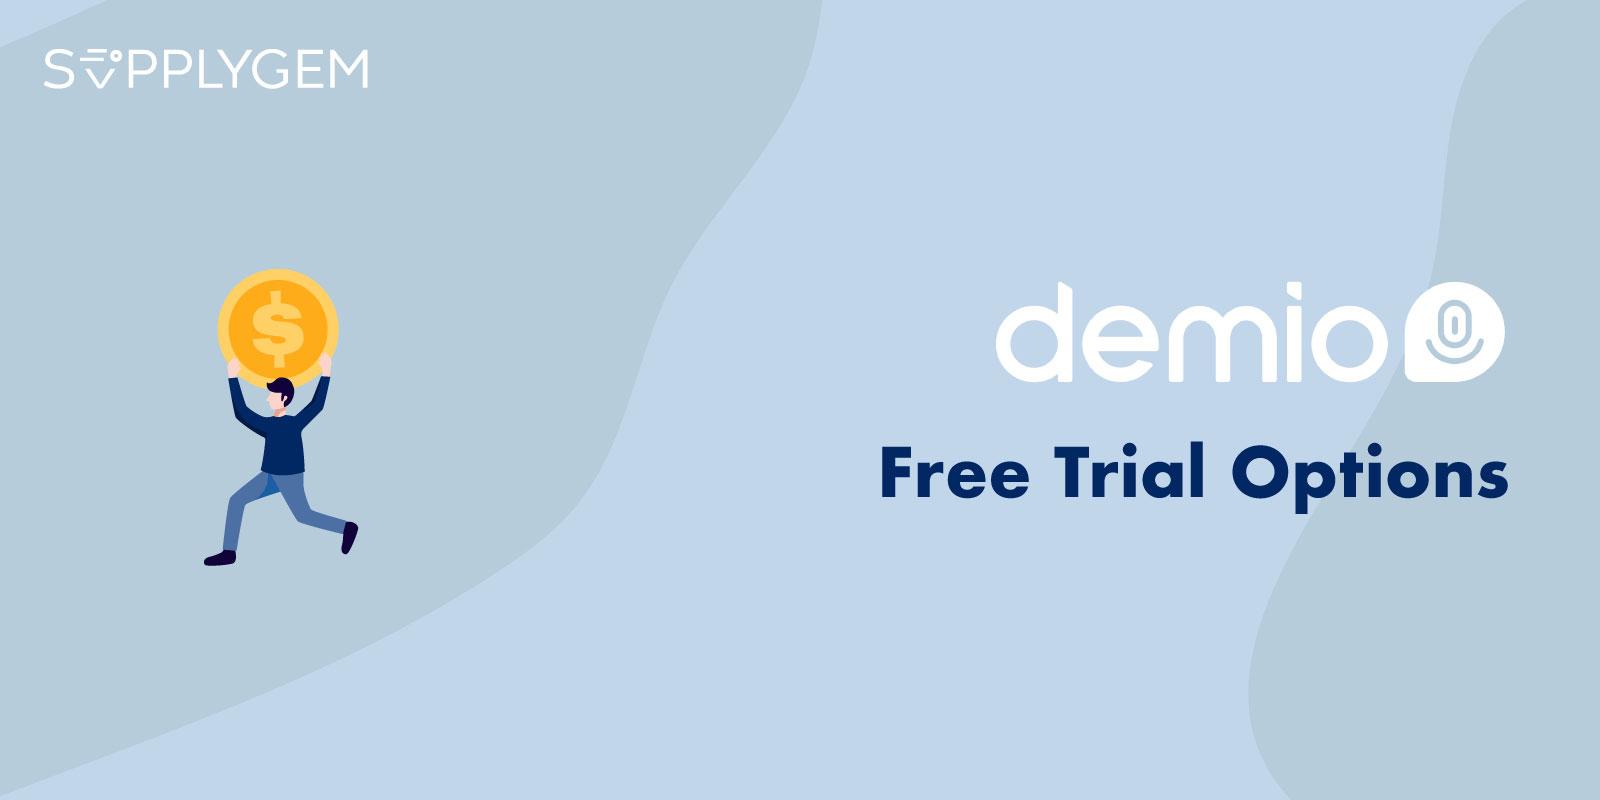 Demio Free Trial